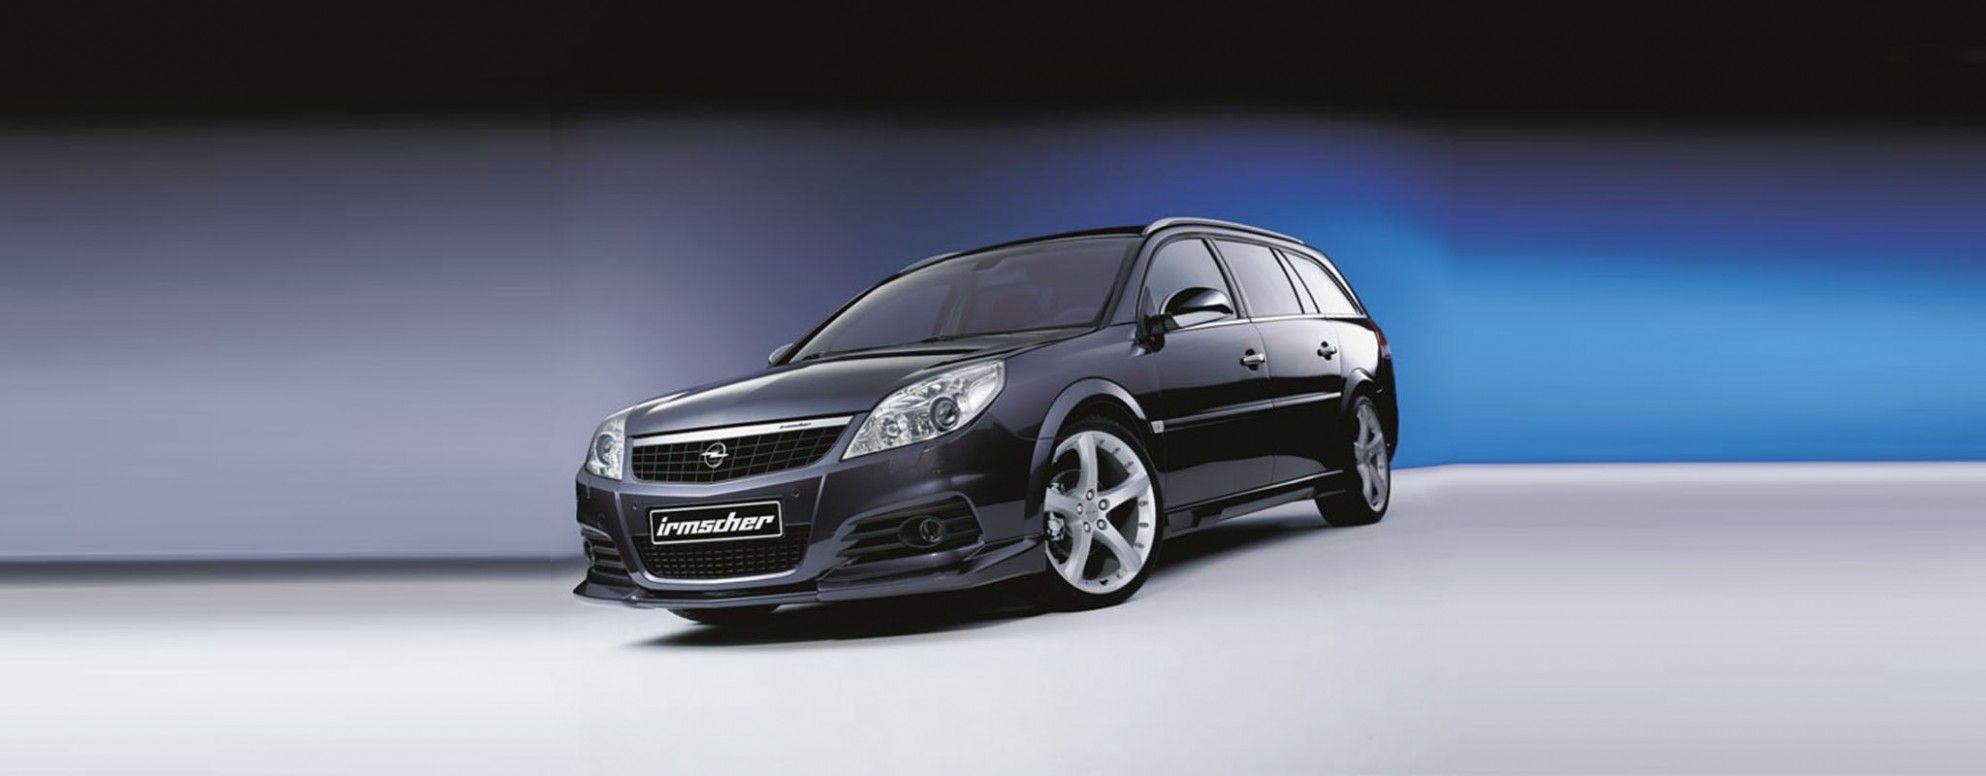 2020 Opel Zafira Fiyatlari First Drive Opel First Drive Driving